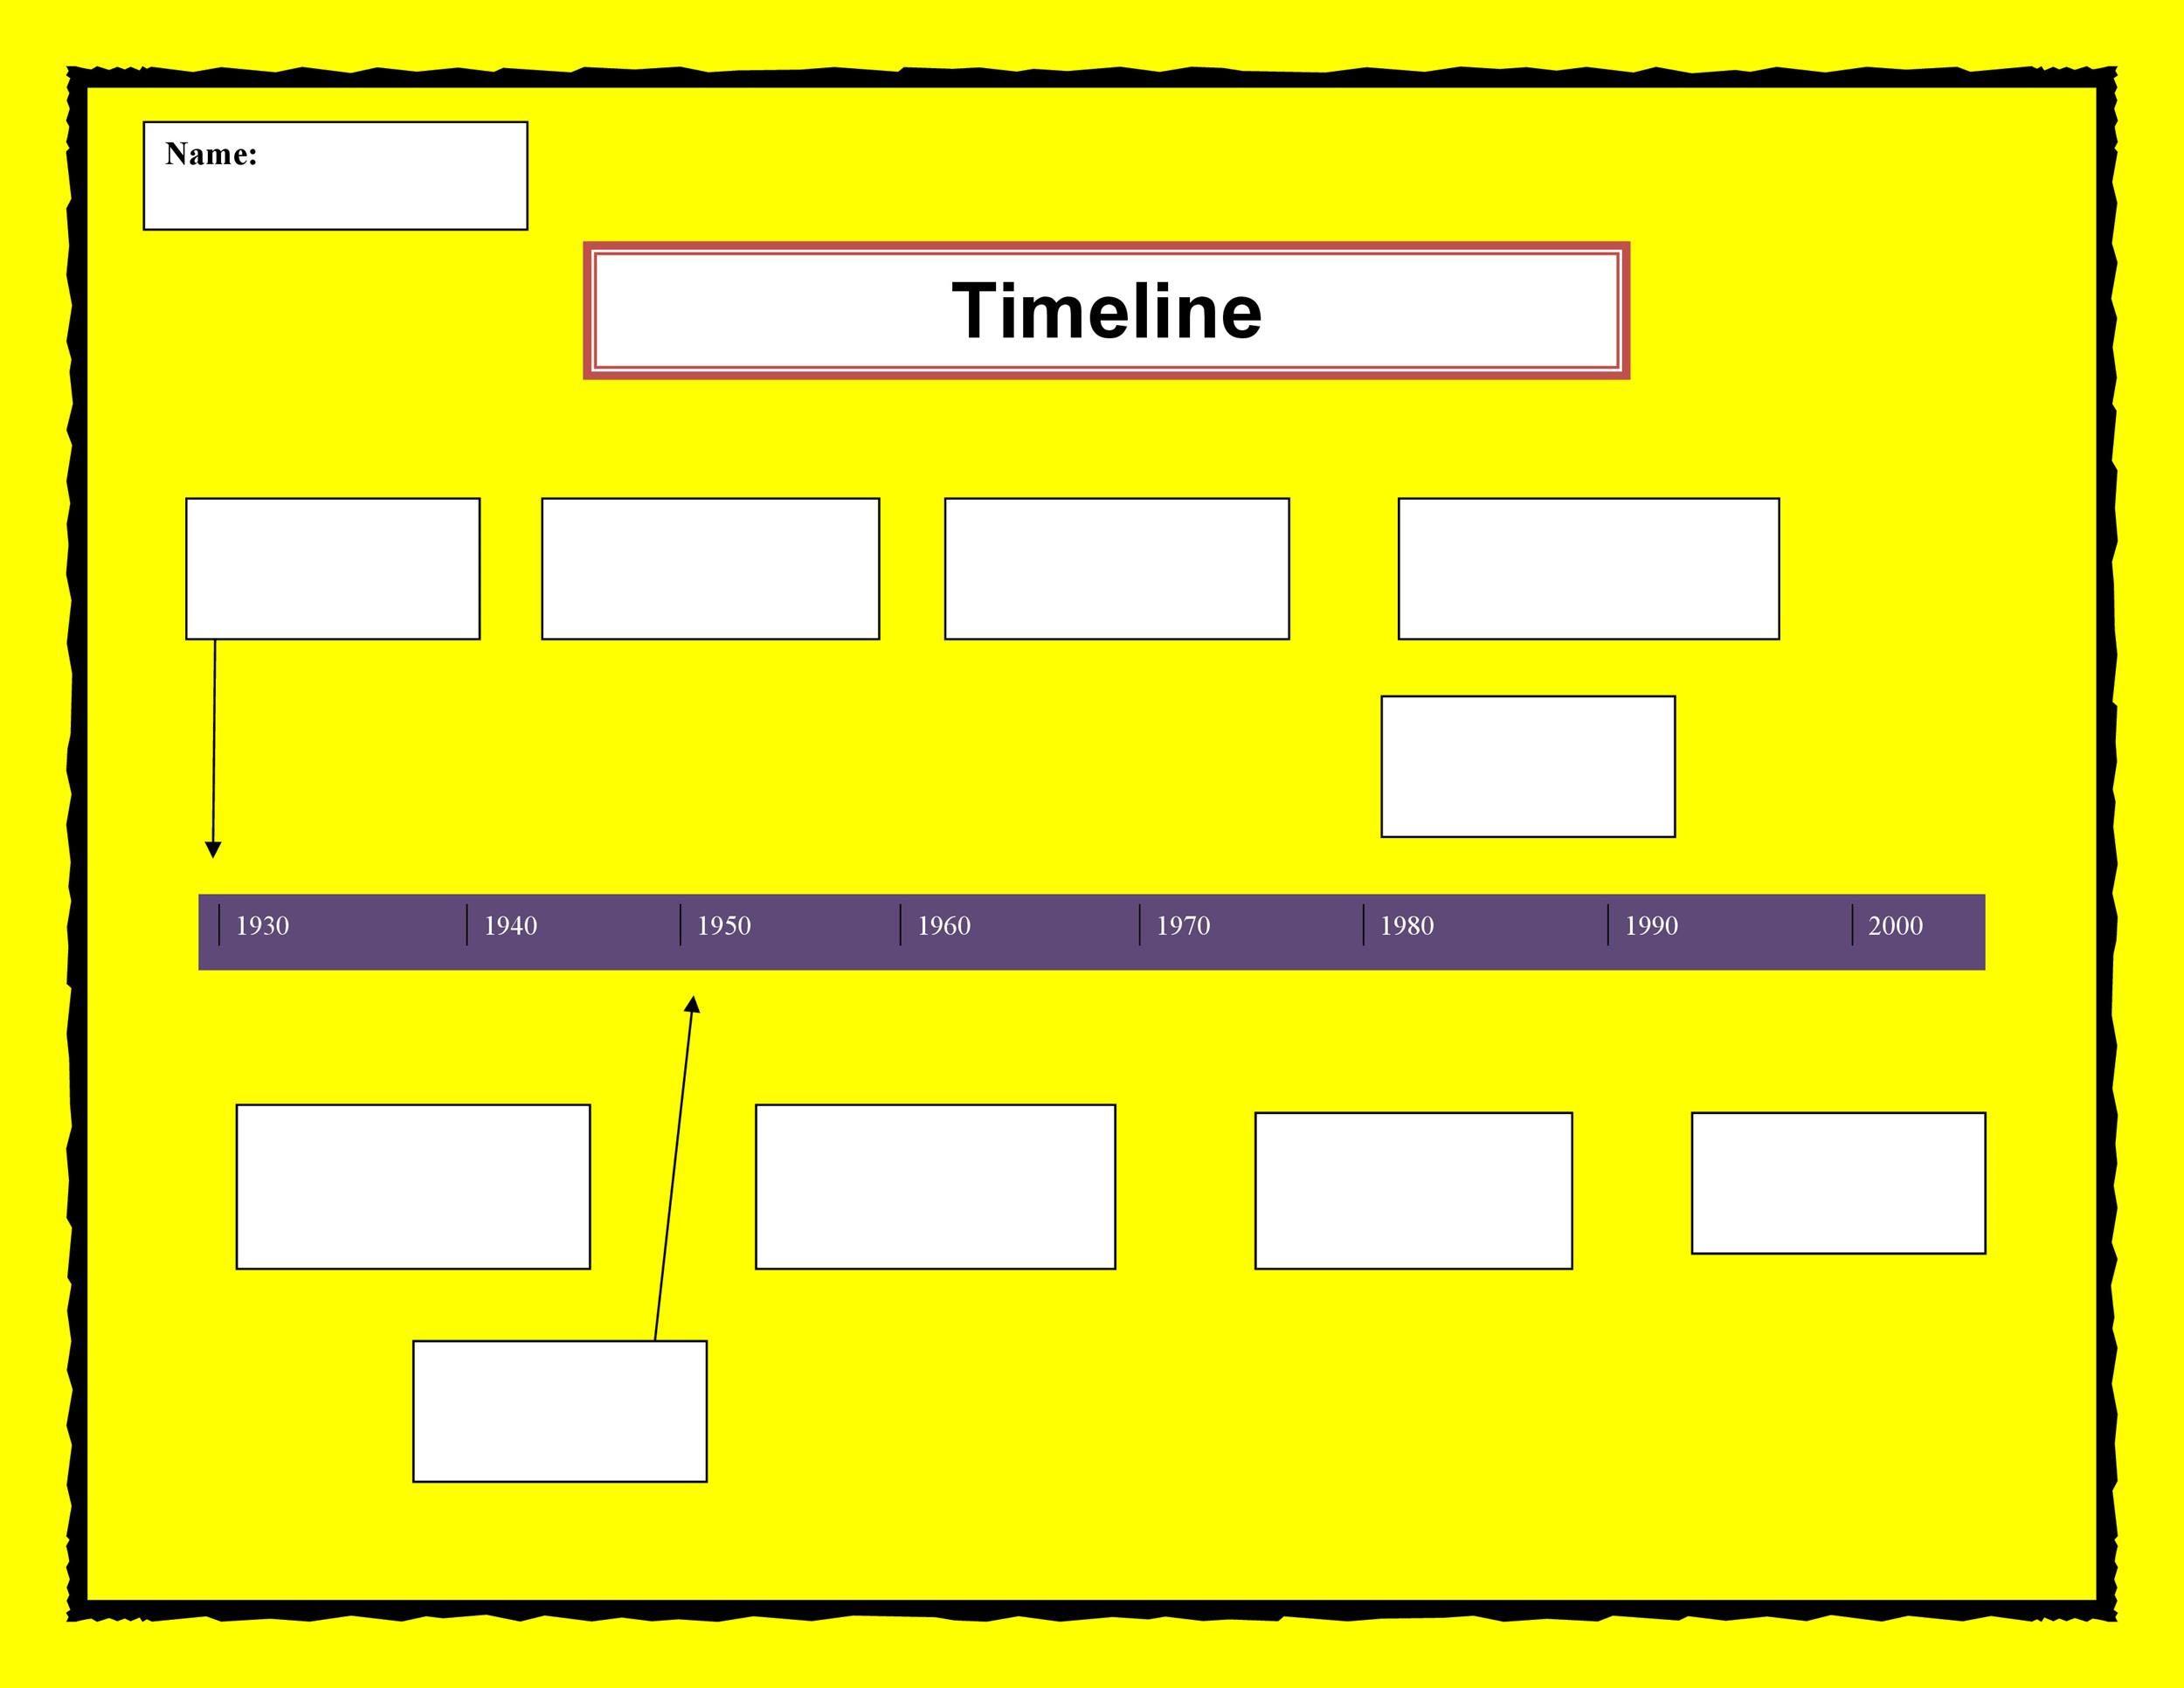 005 Simple Timeline Template For Word Sample  Wordpres FreeFull